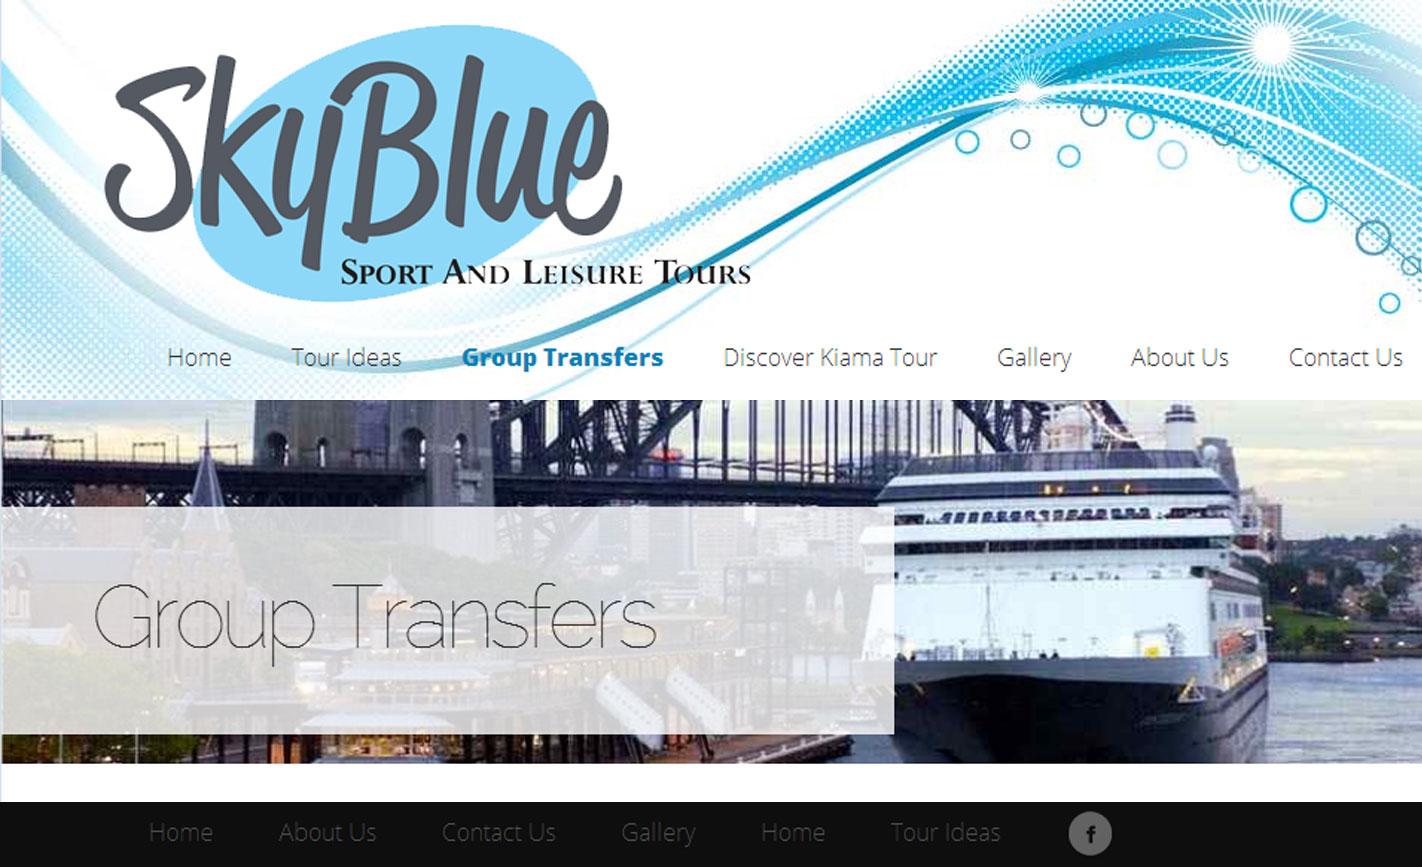 Sky Blue Sport & Leisure Tours Website Design